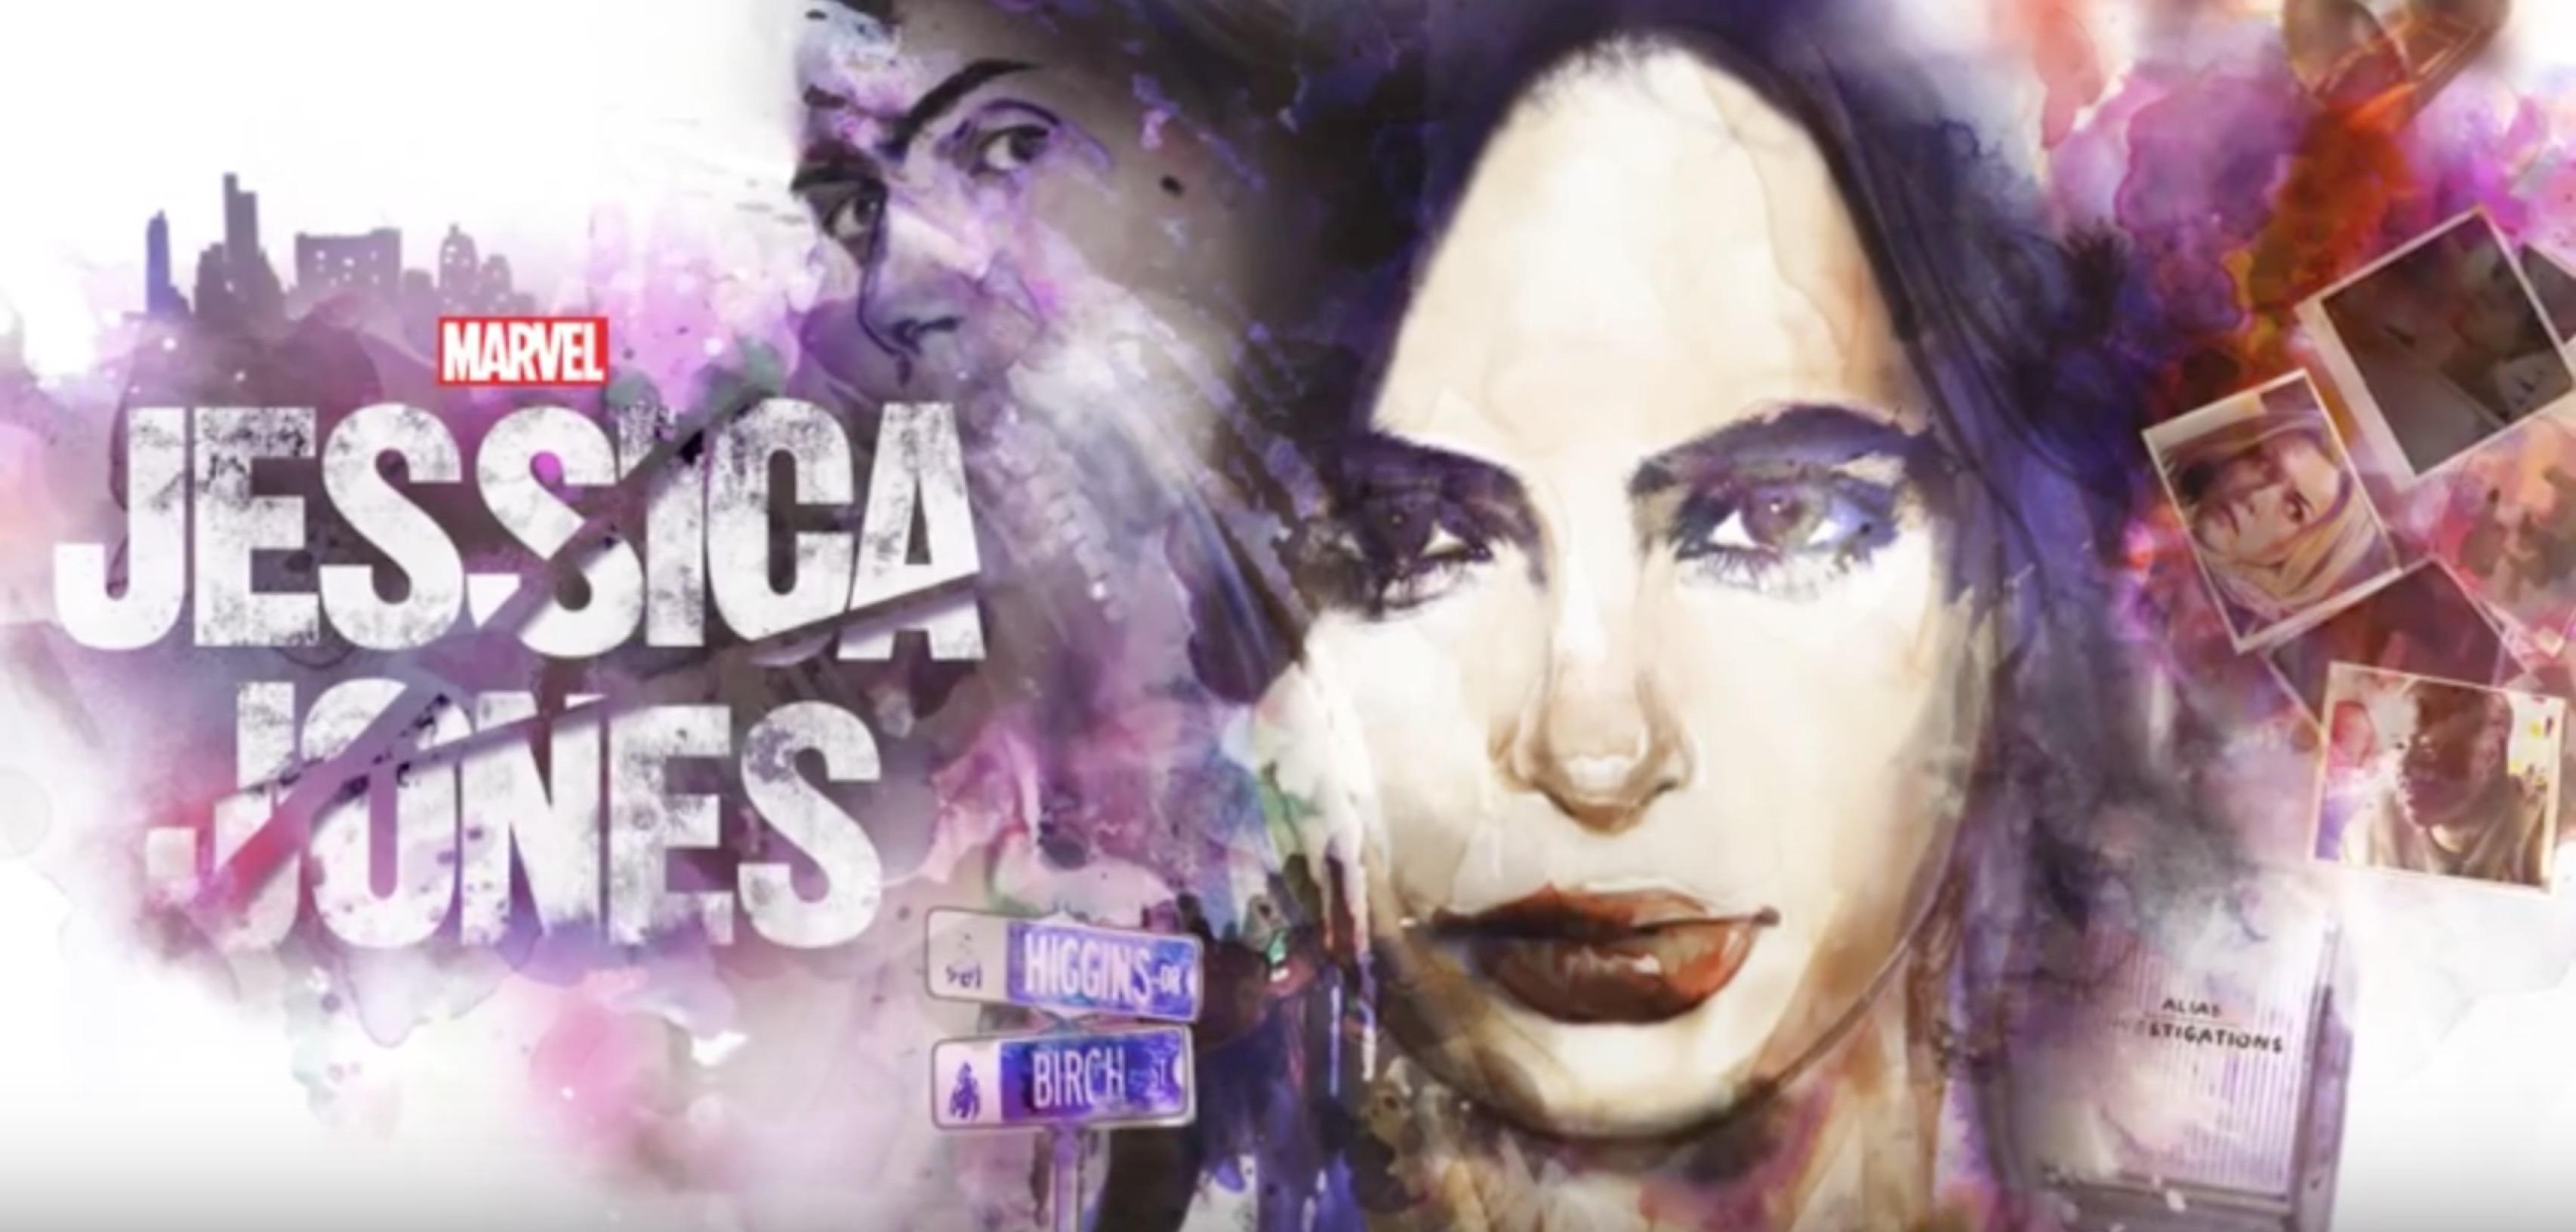 Jessica Jones renovada por una segunda temporada